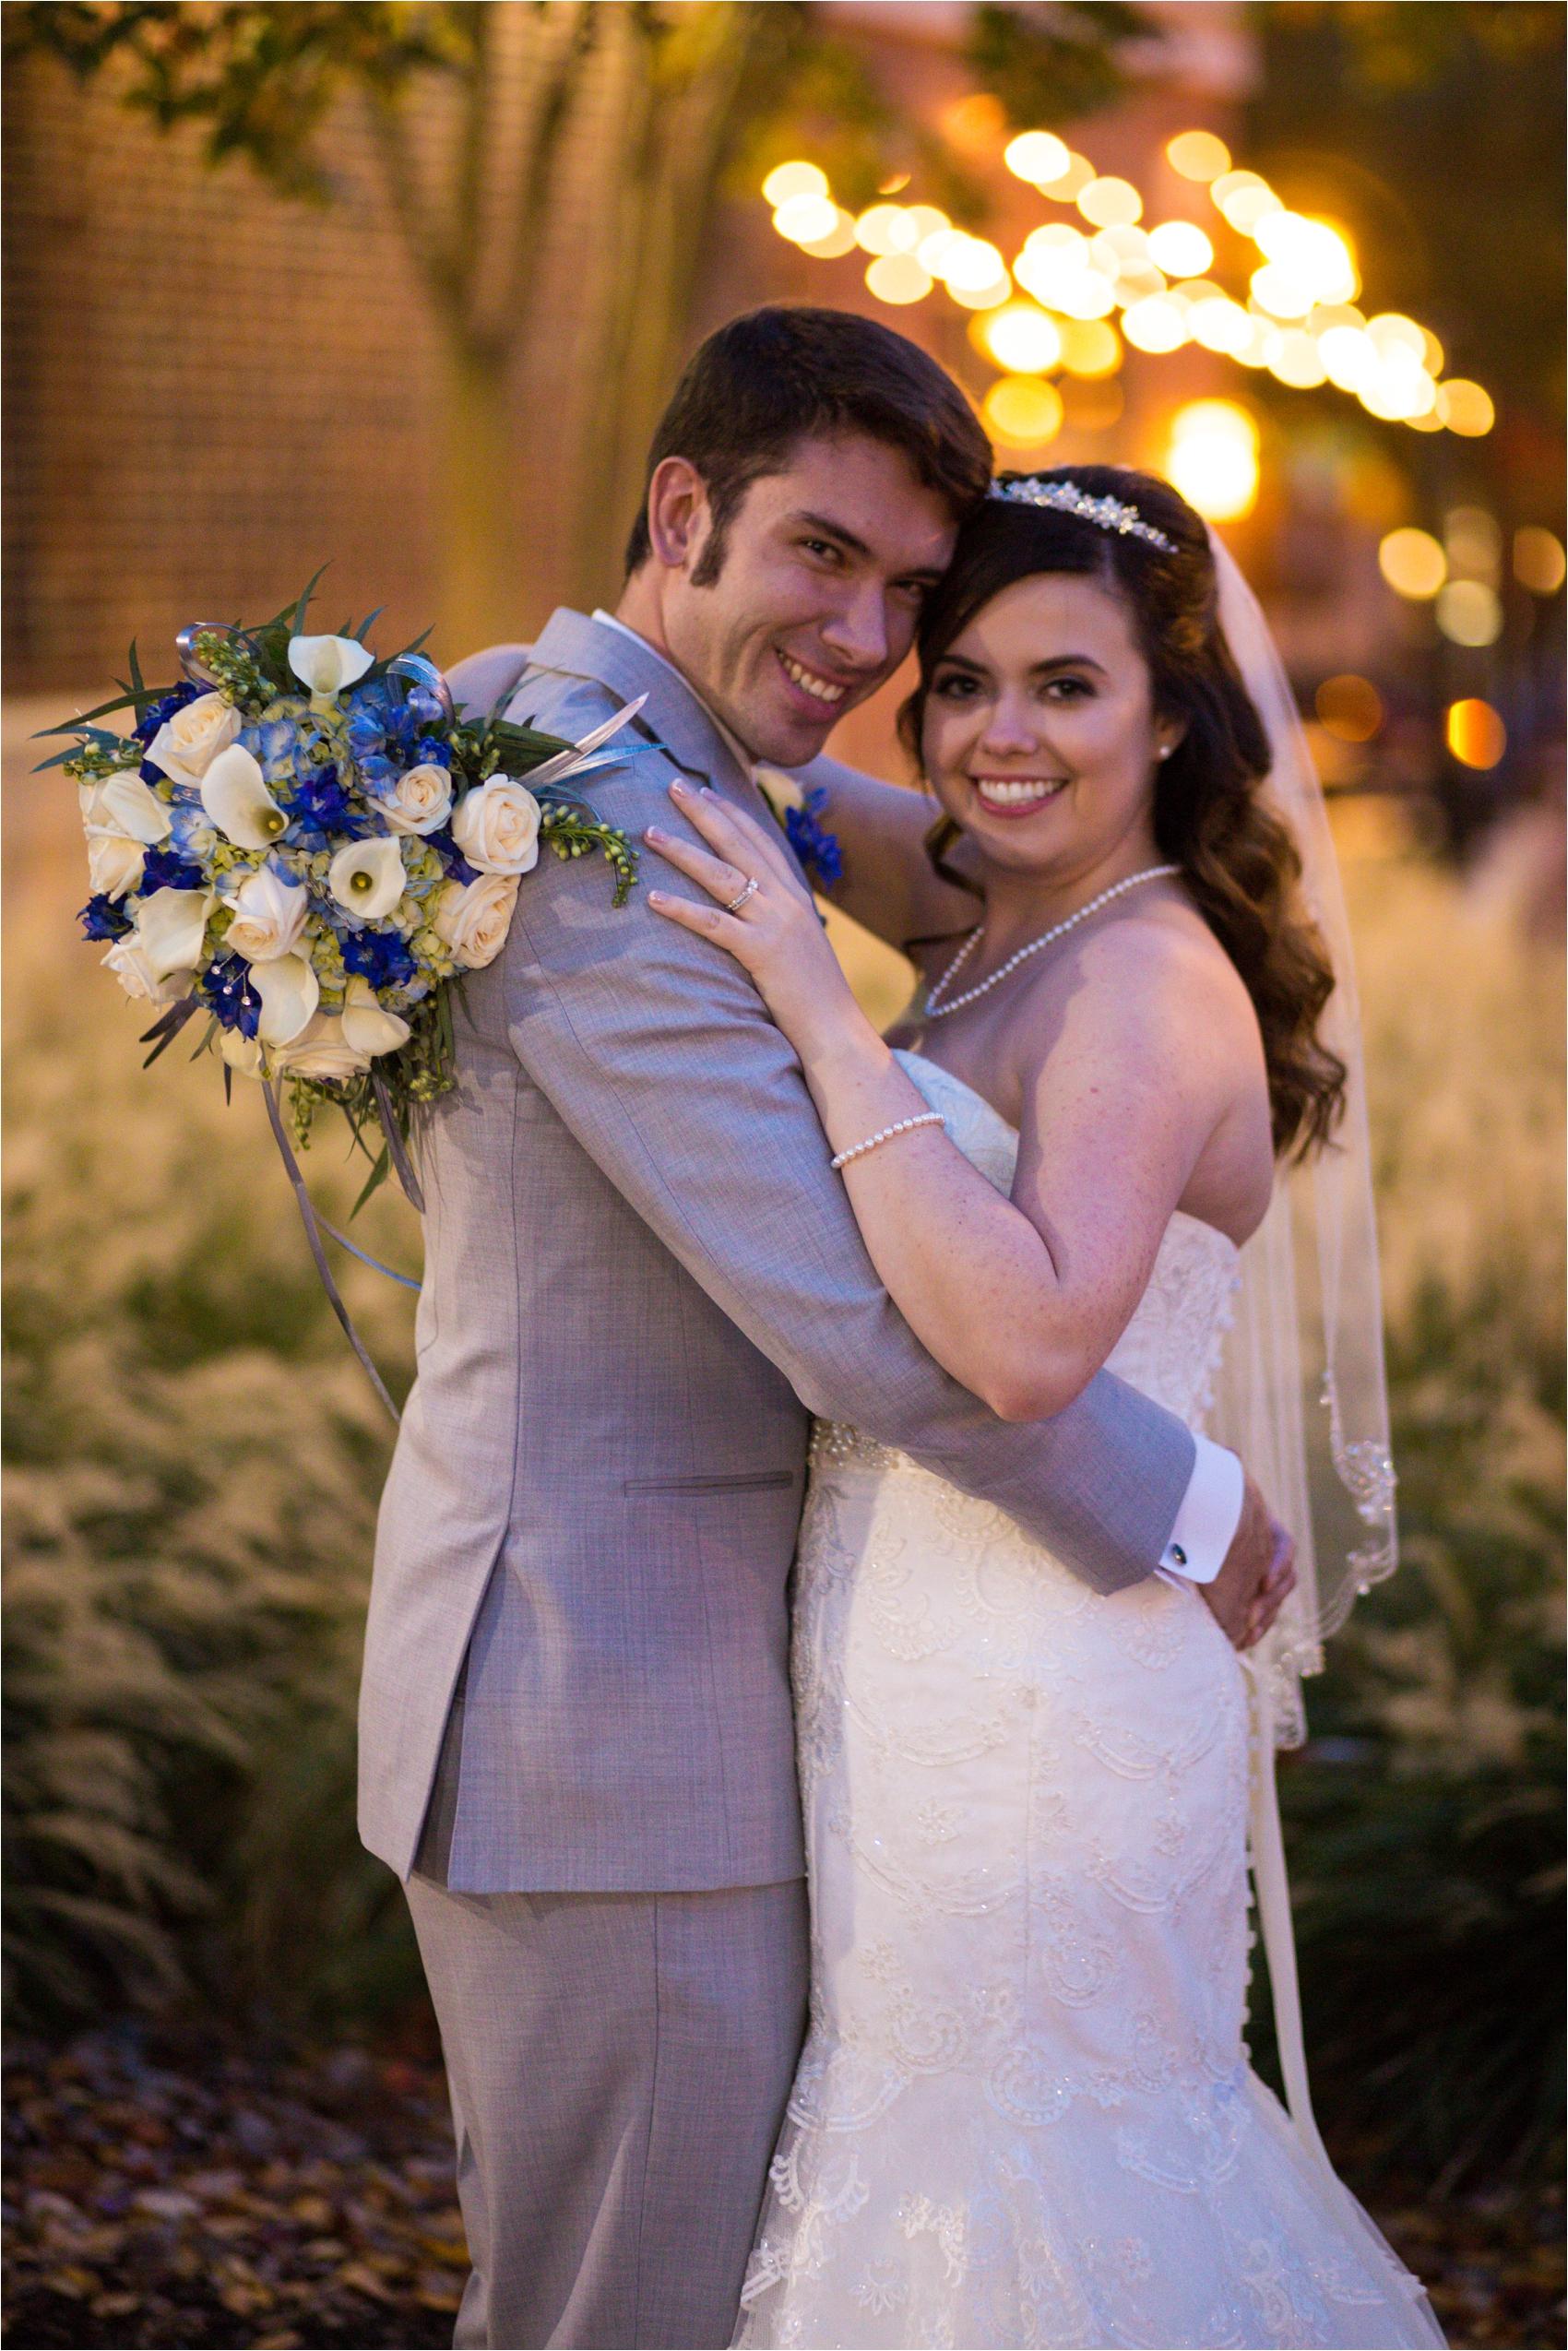 Newport-News-Winter-Wonderland-Wedding_0195.jpg